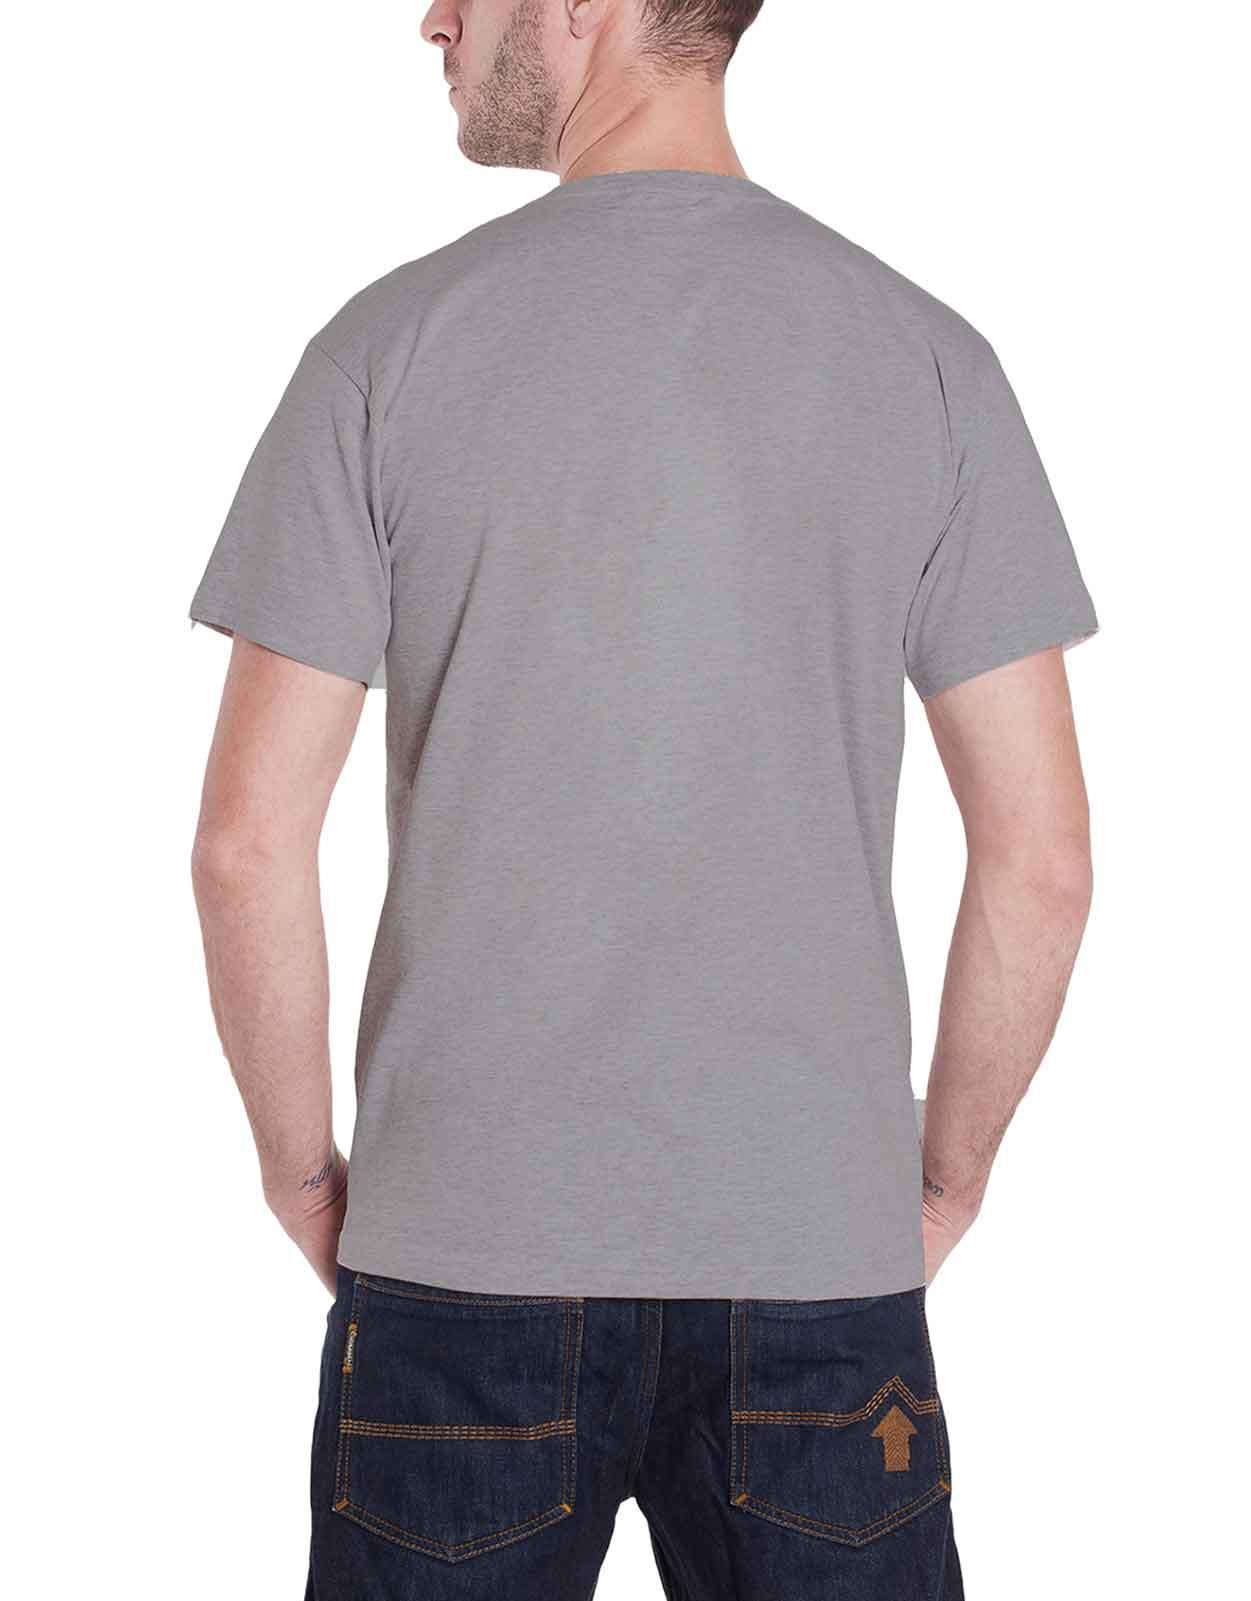 Officiel-Jimi-Hendrix-T-Shirt-Purple-Haze-Are-you-experienced-Logo-Homme-NEUF miniature 15